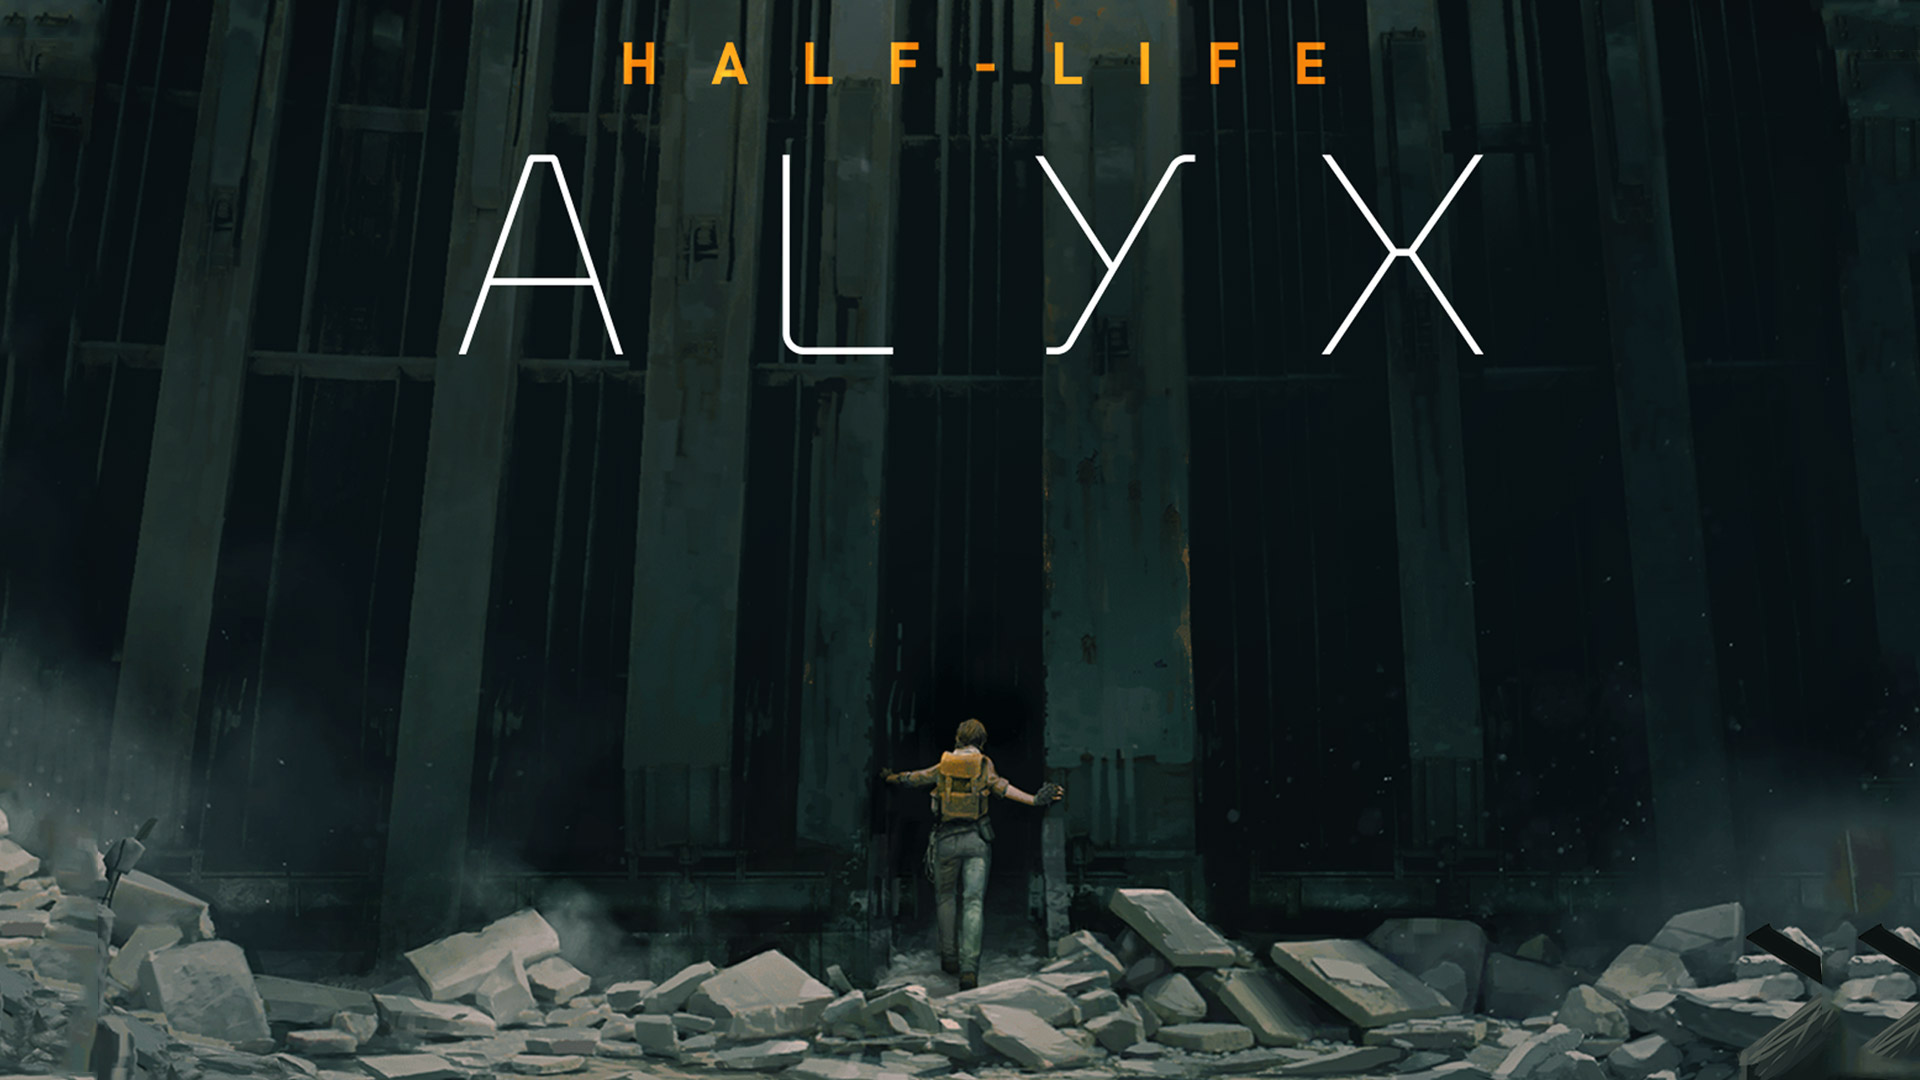 Free Half-Life: Alyx Wallpaper in 1920x1080